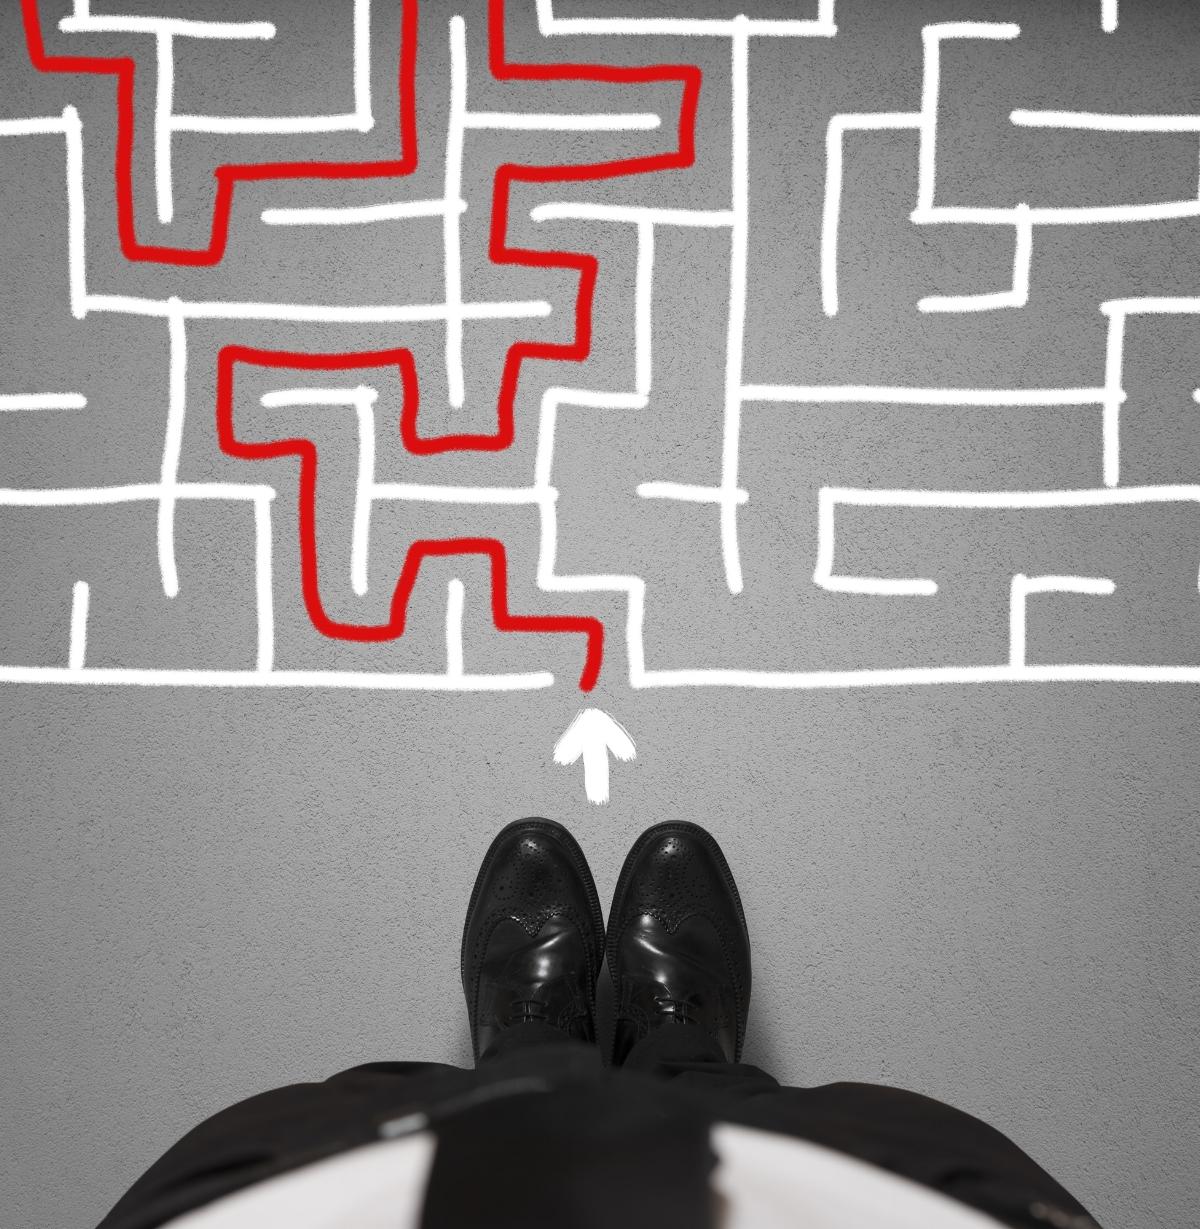 career-management-theprouddiplomat